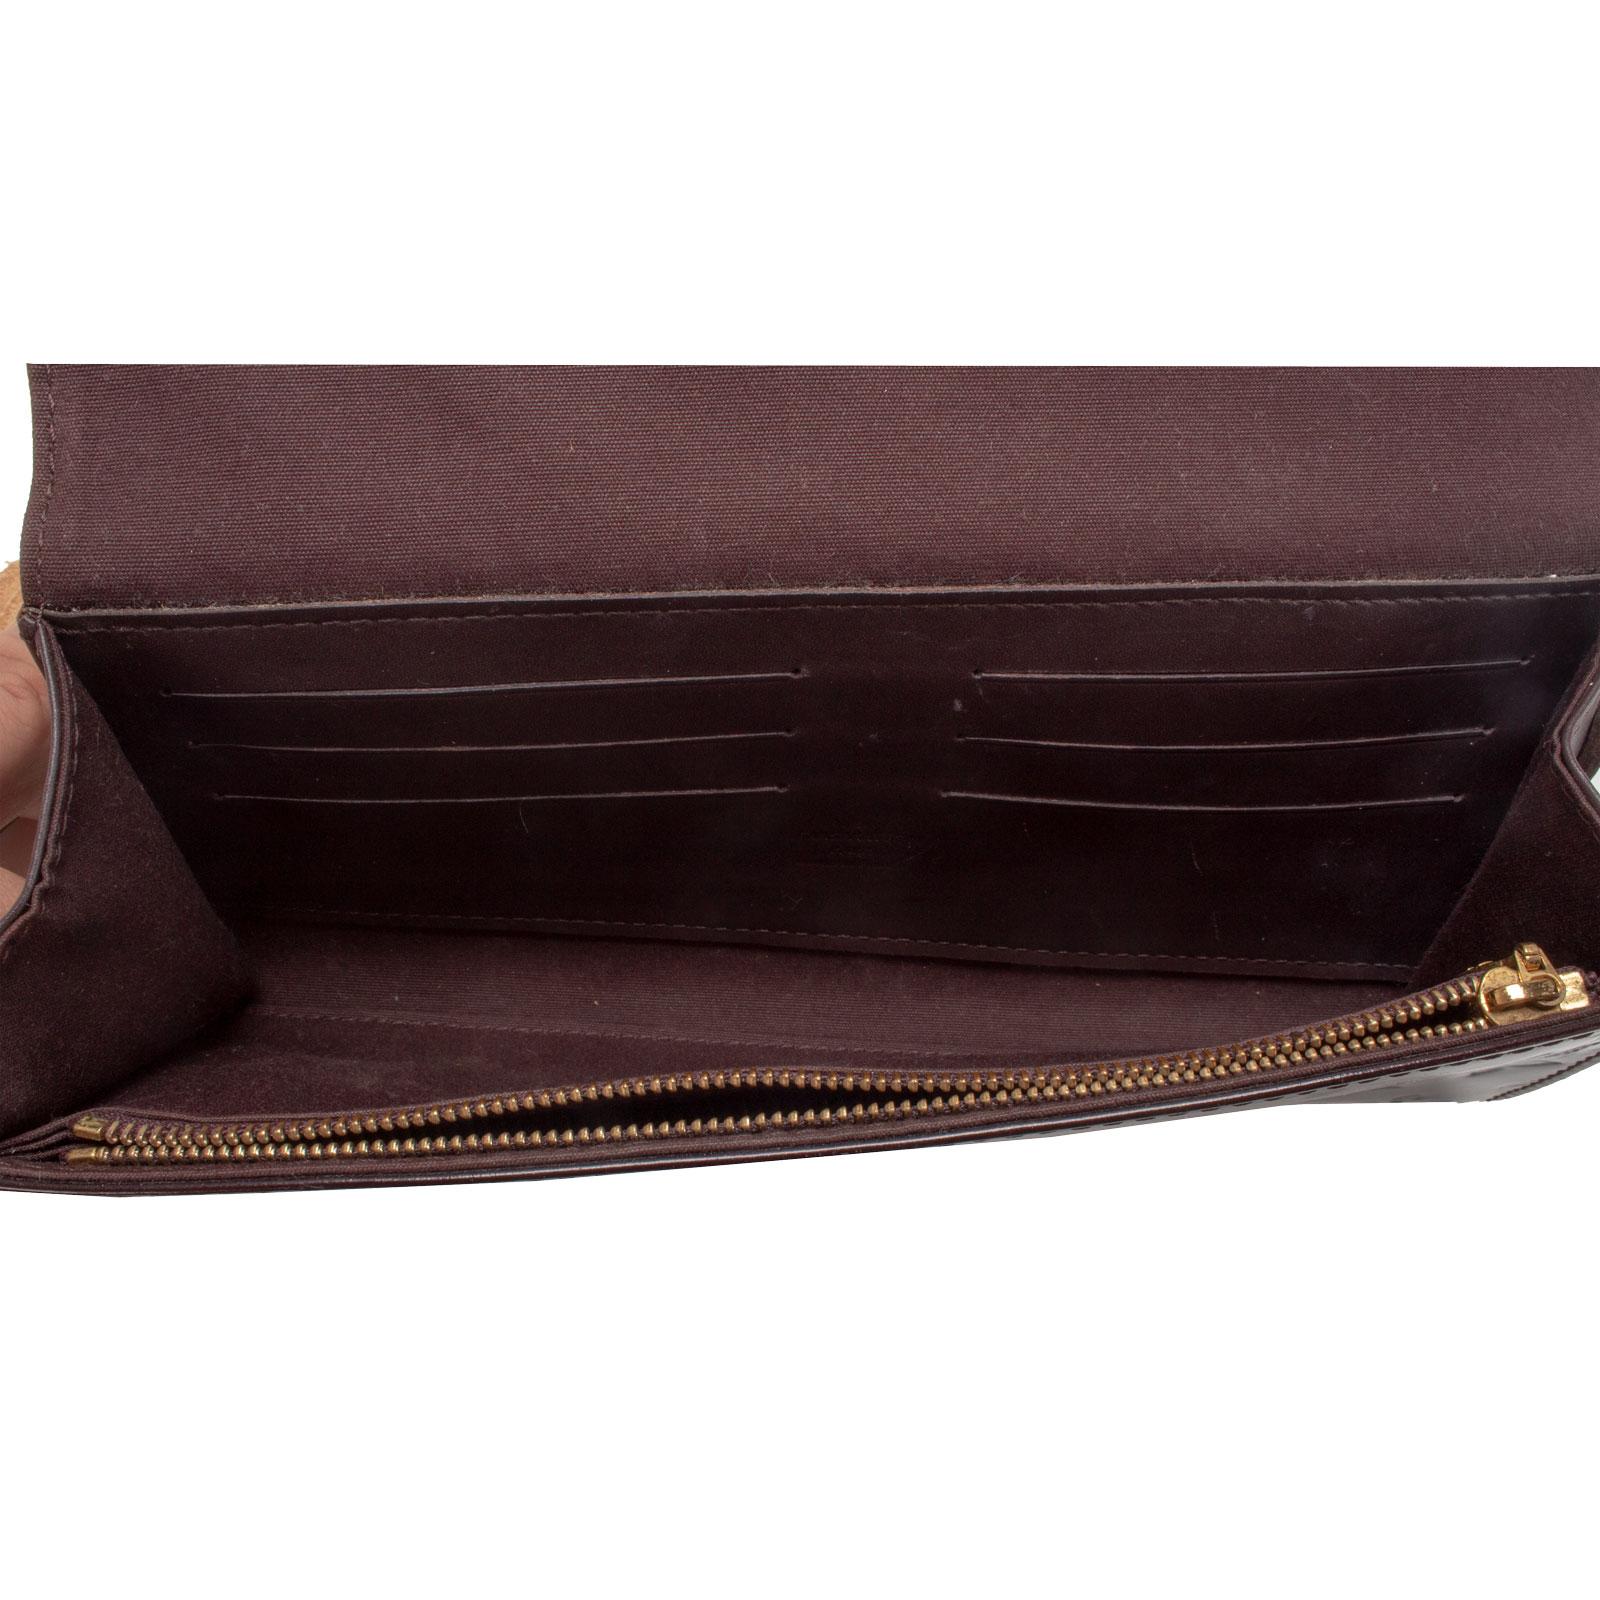 d5c89ec41 Clutch Louis Vuitton Sunset Boulevard | Box de Grife